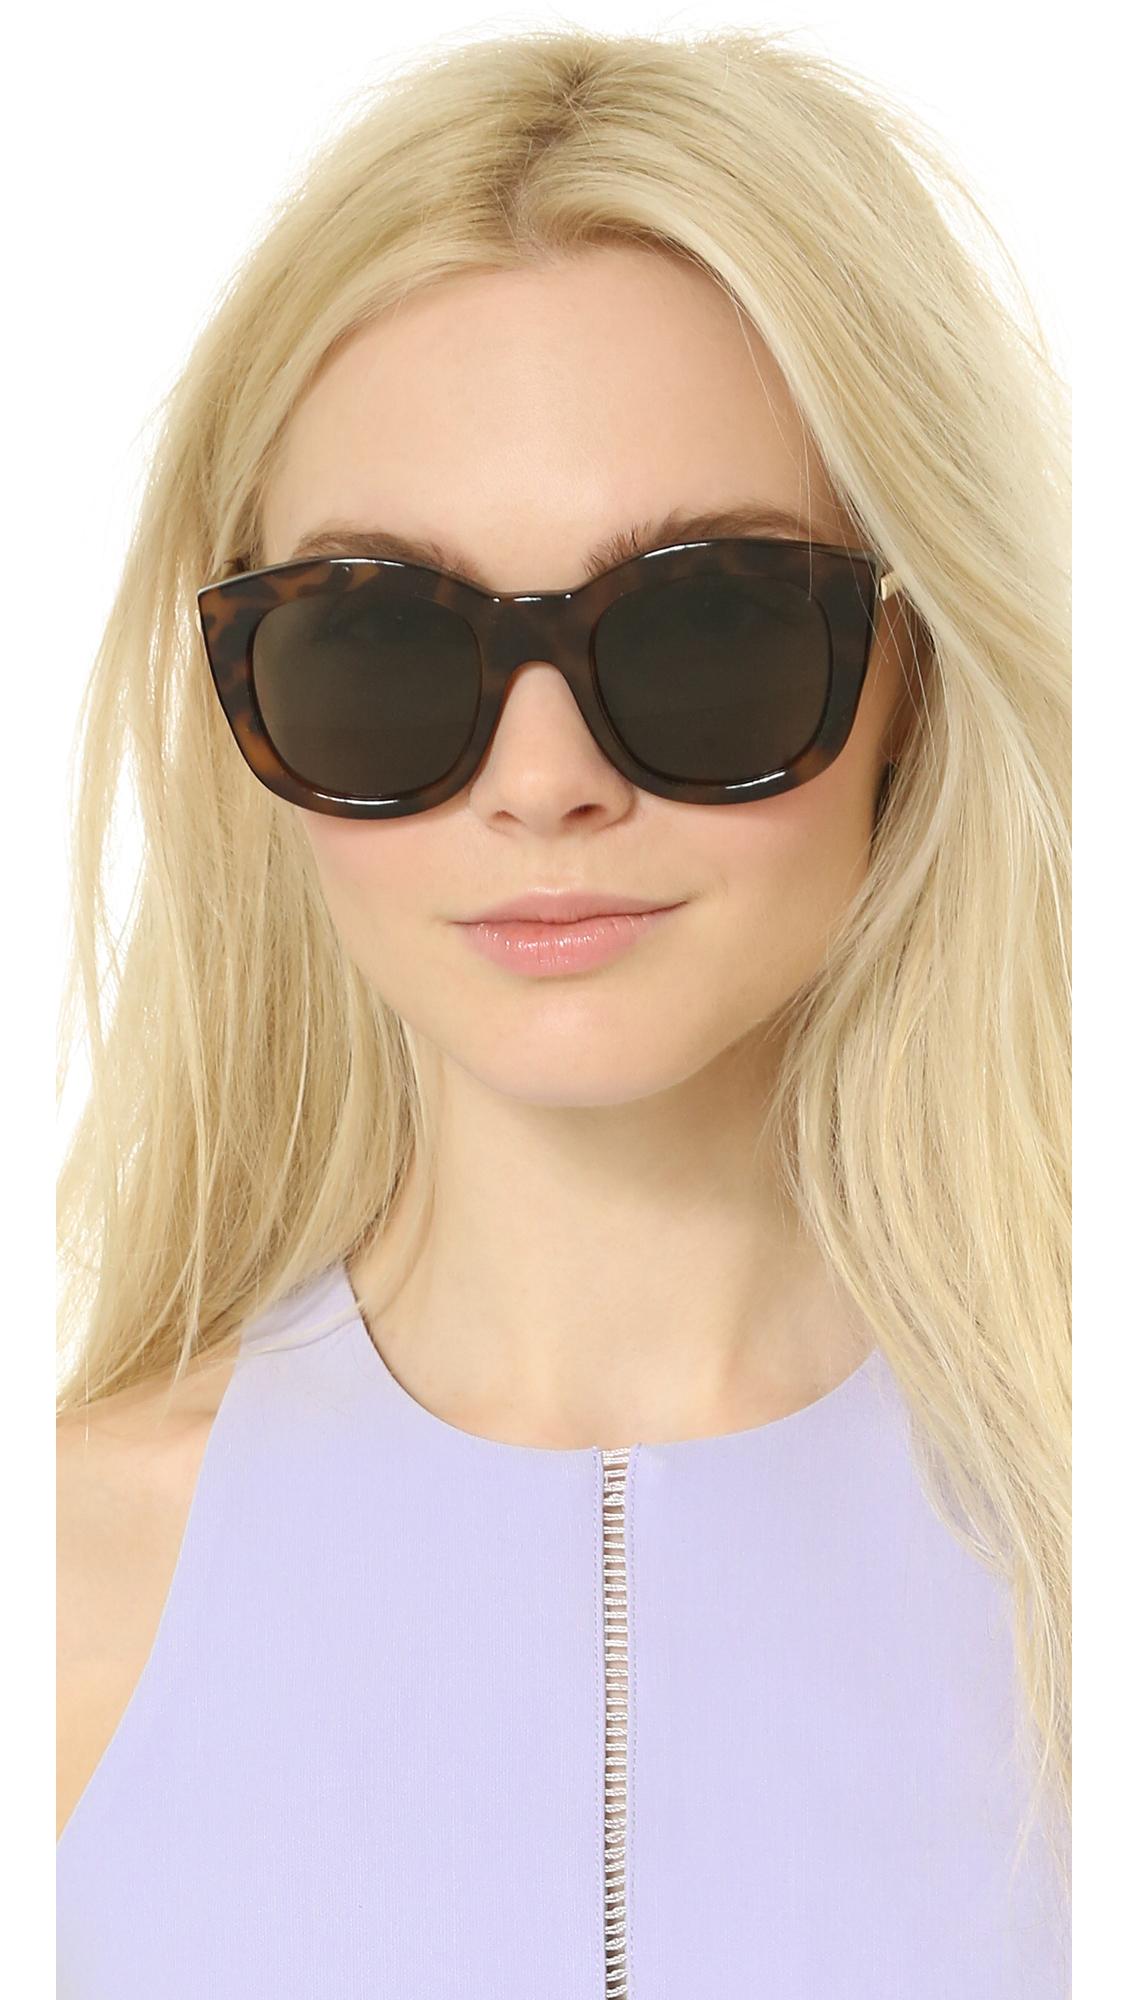 71d824522e3 Lyst - Le Specs Runway Luxe Mirrored Sunglasses - Milky Tort khaki ...